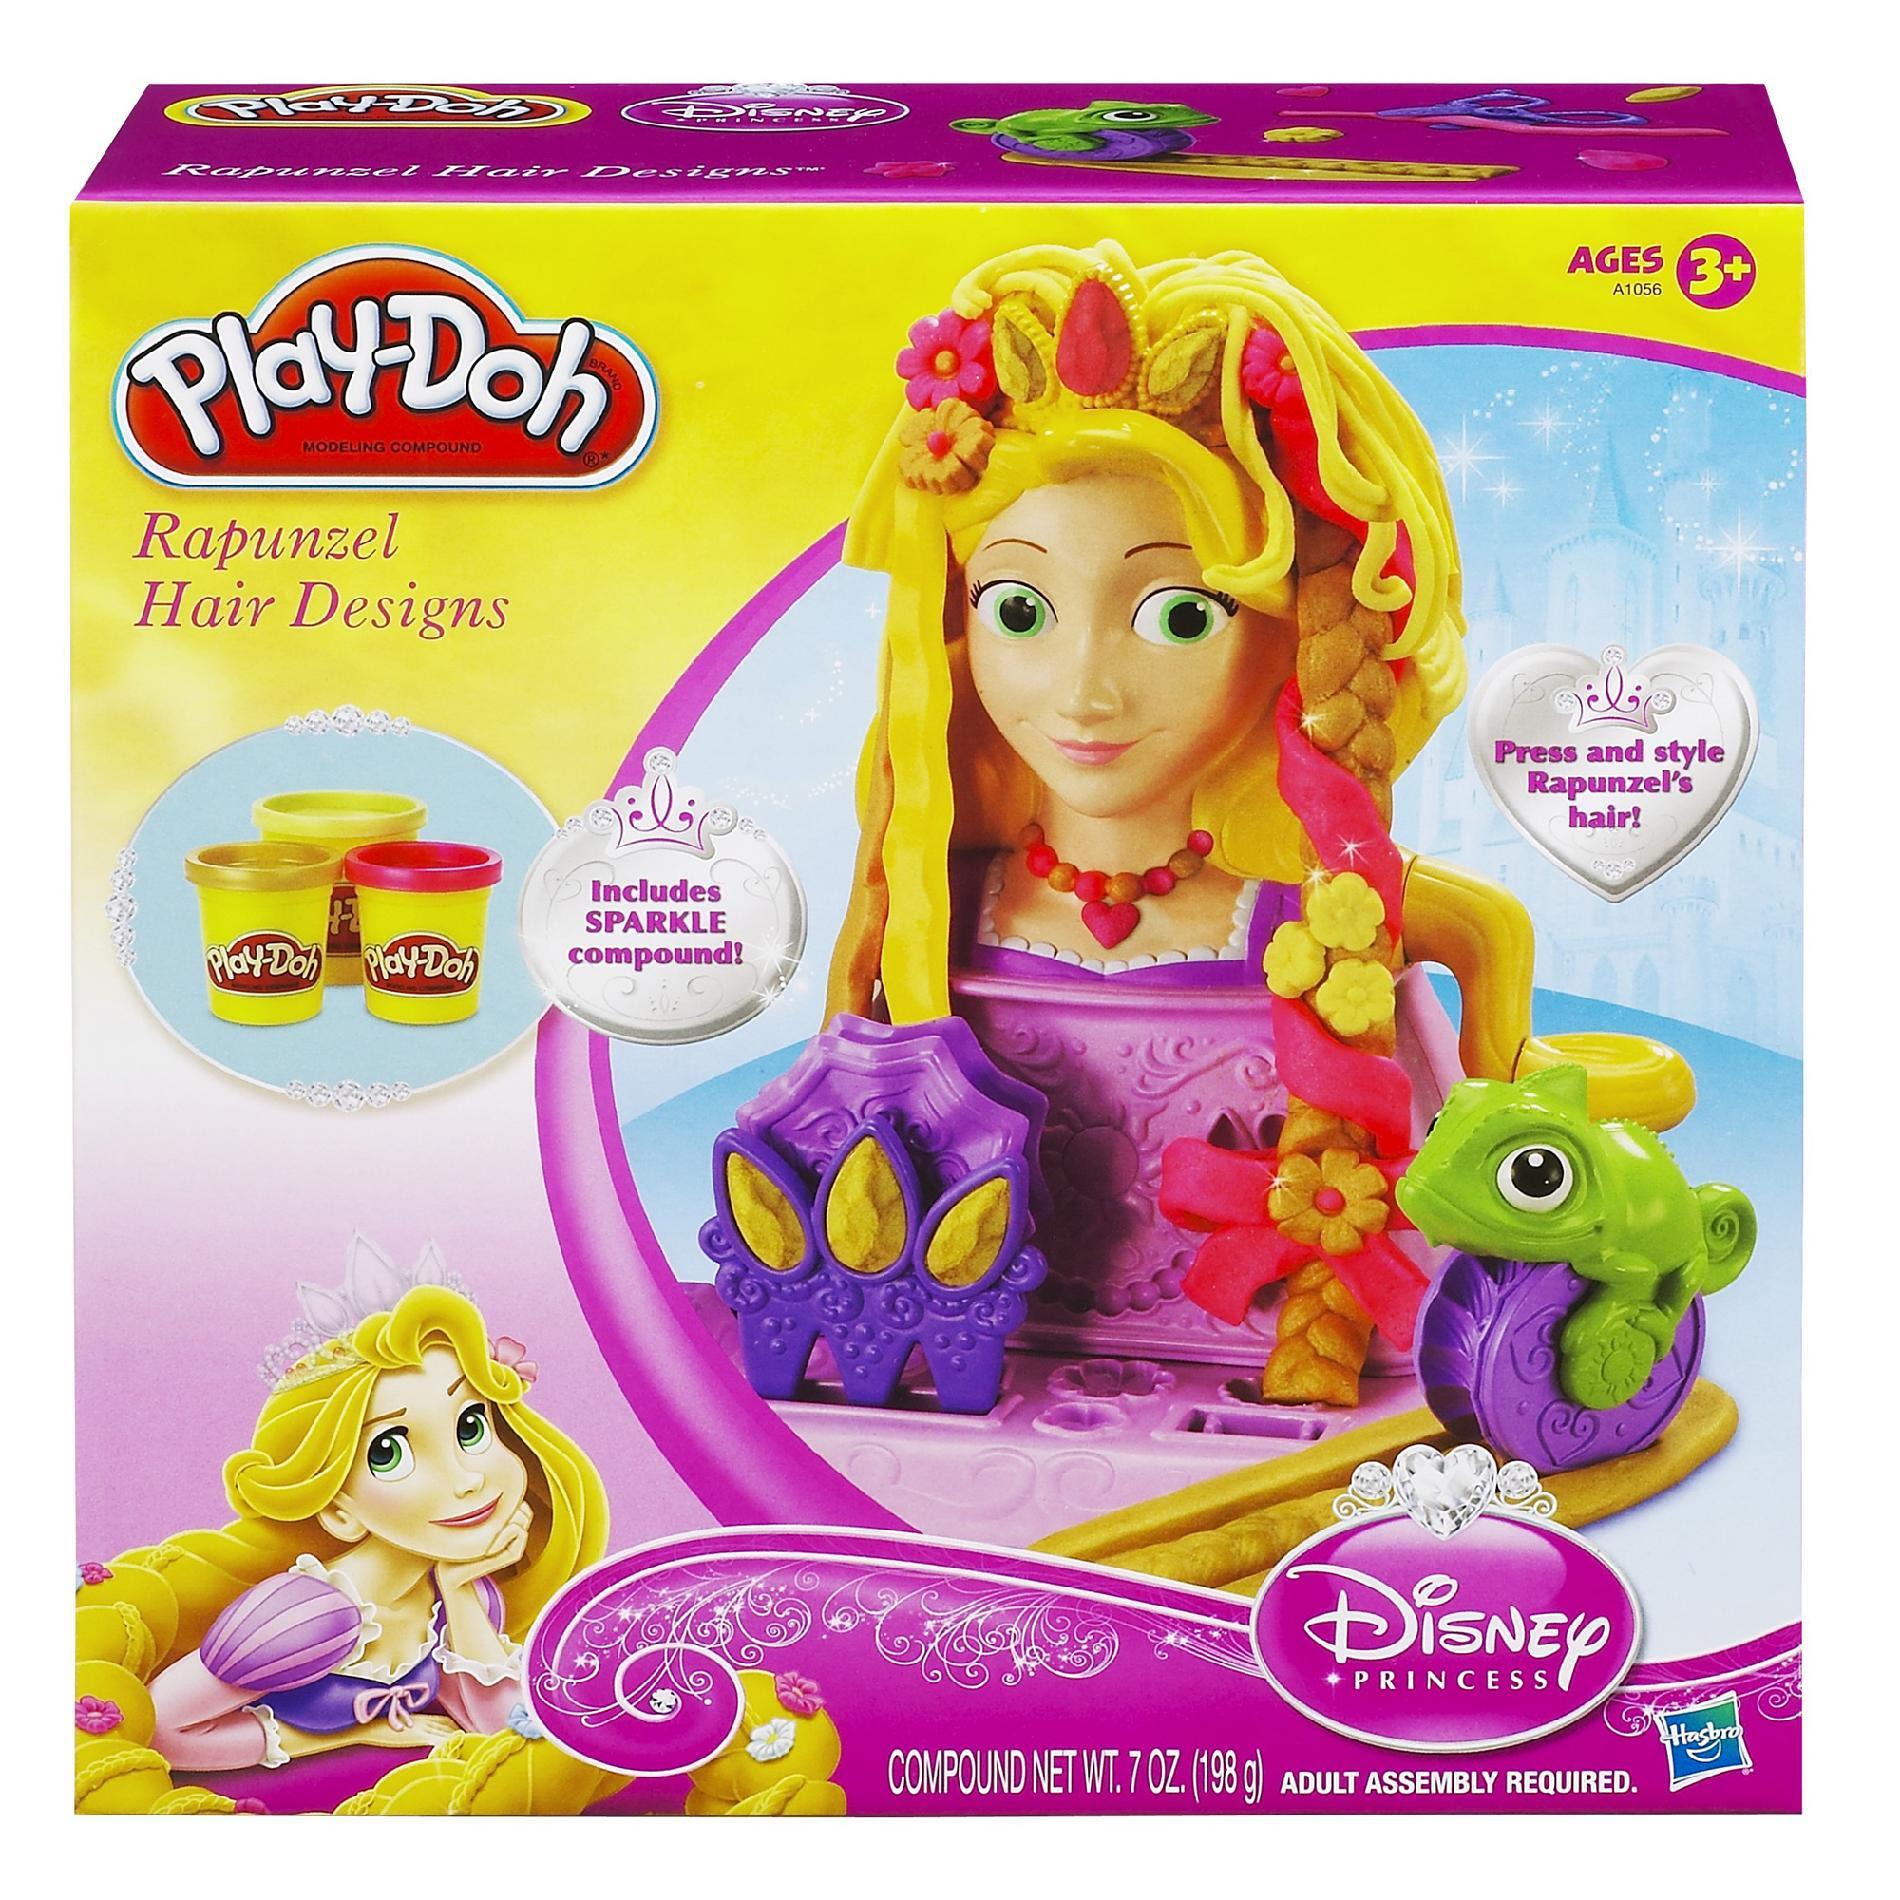 Disney Princess Rapunzel Hair Designs Set